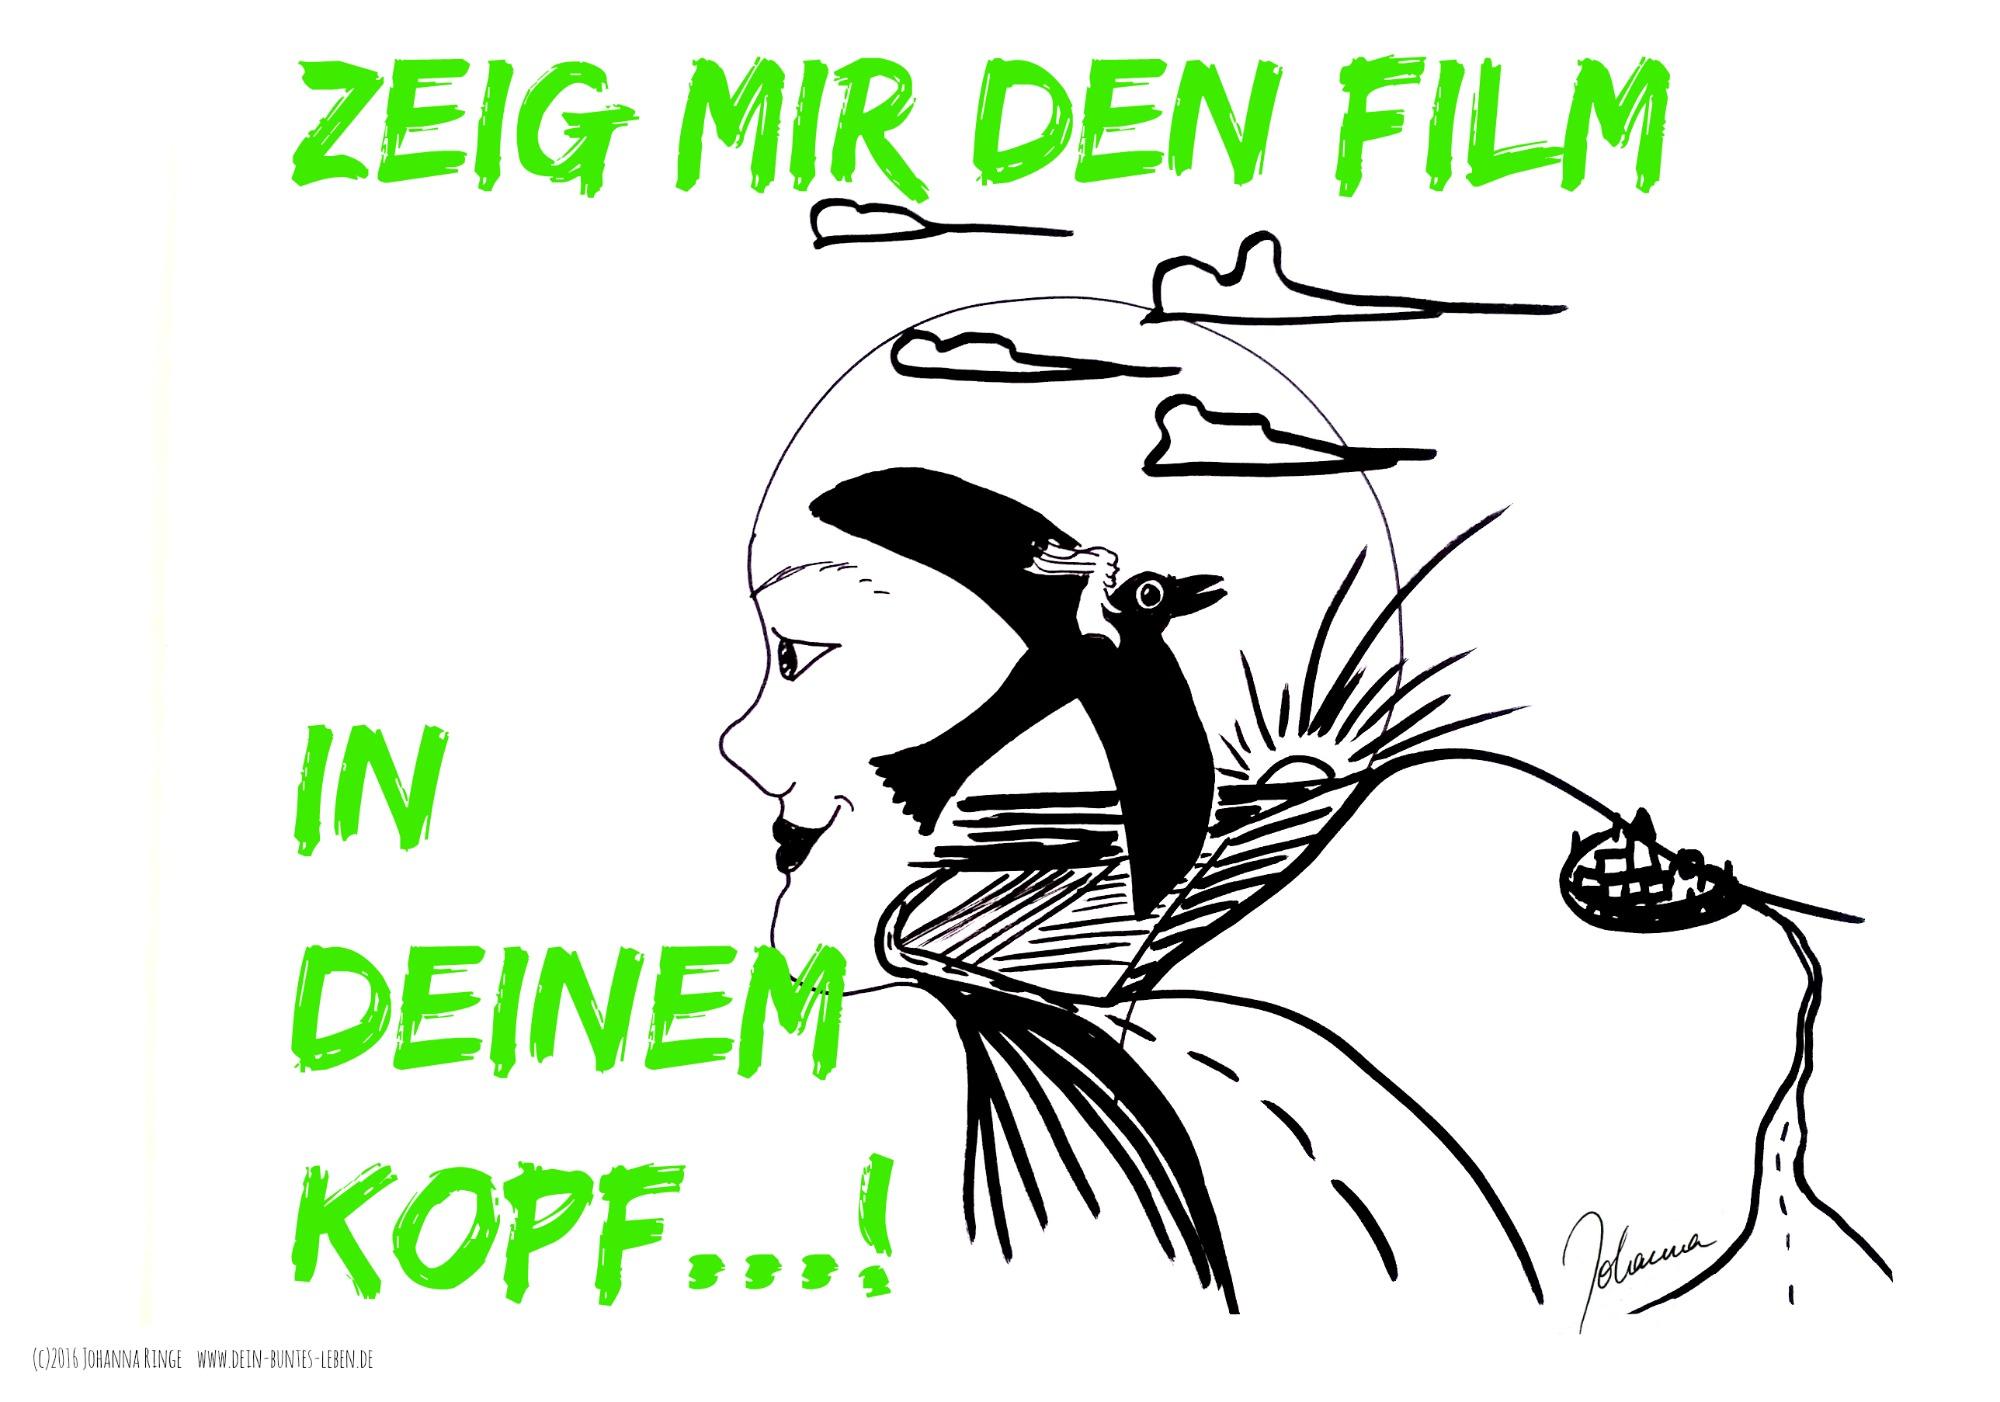 Bilderdenken - Zeig mir den Film in Deinem Kopf, Bilderdenker! (c)2016 Johanna Ringe www.dein-buntes-leben.de